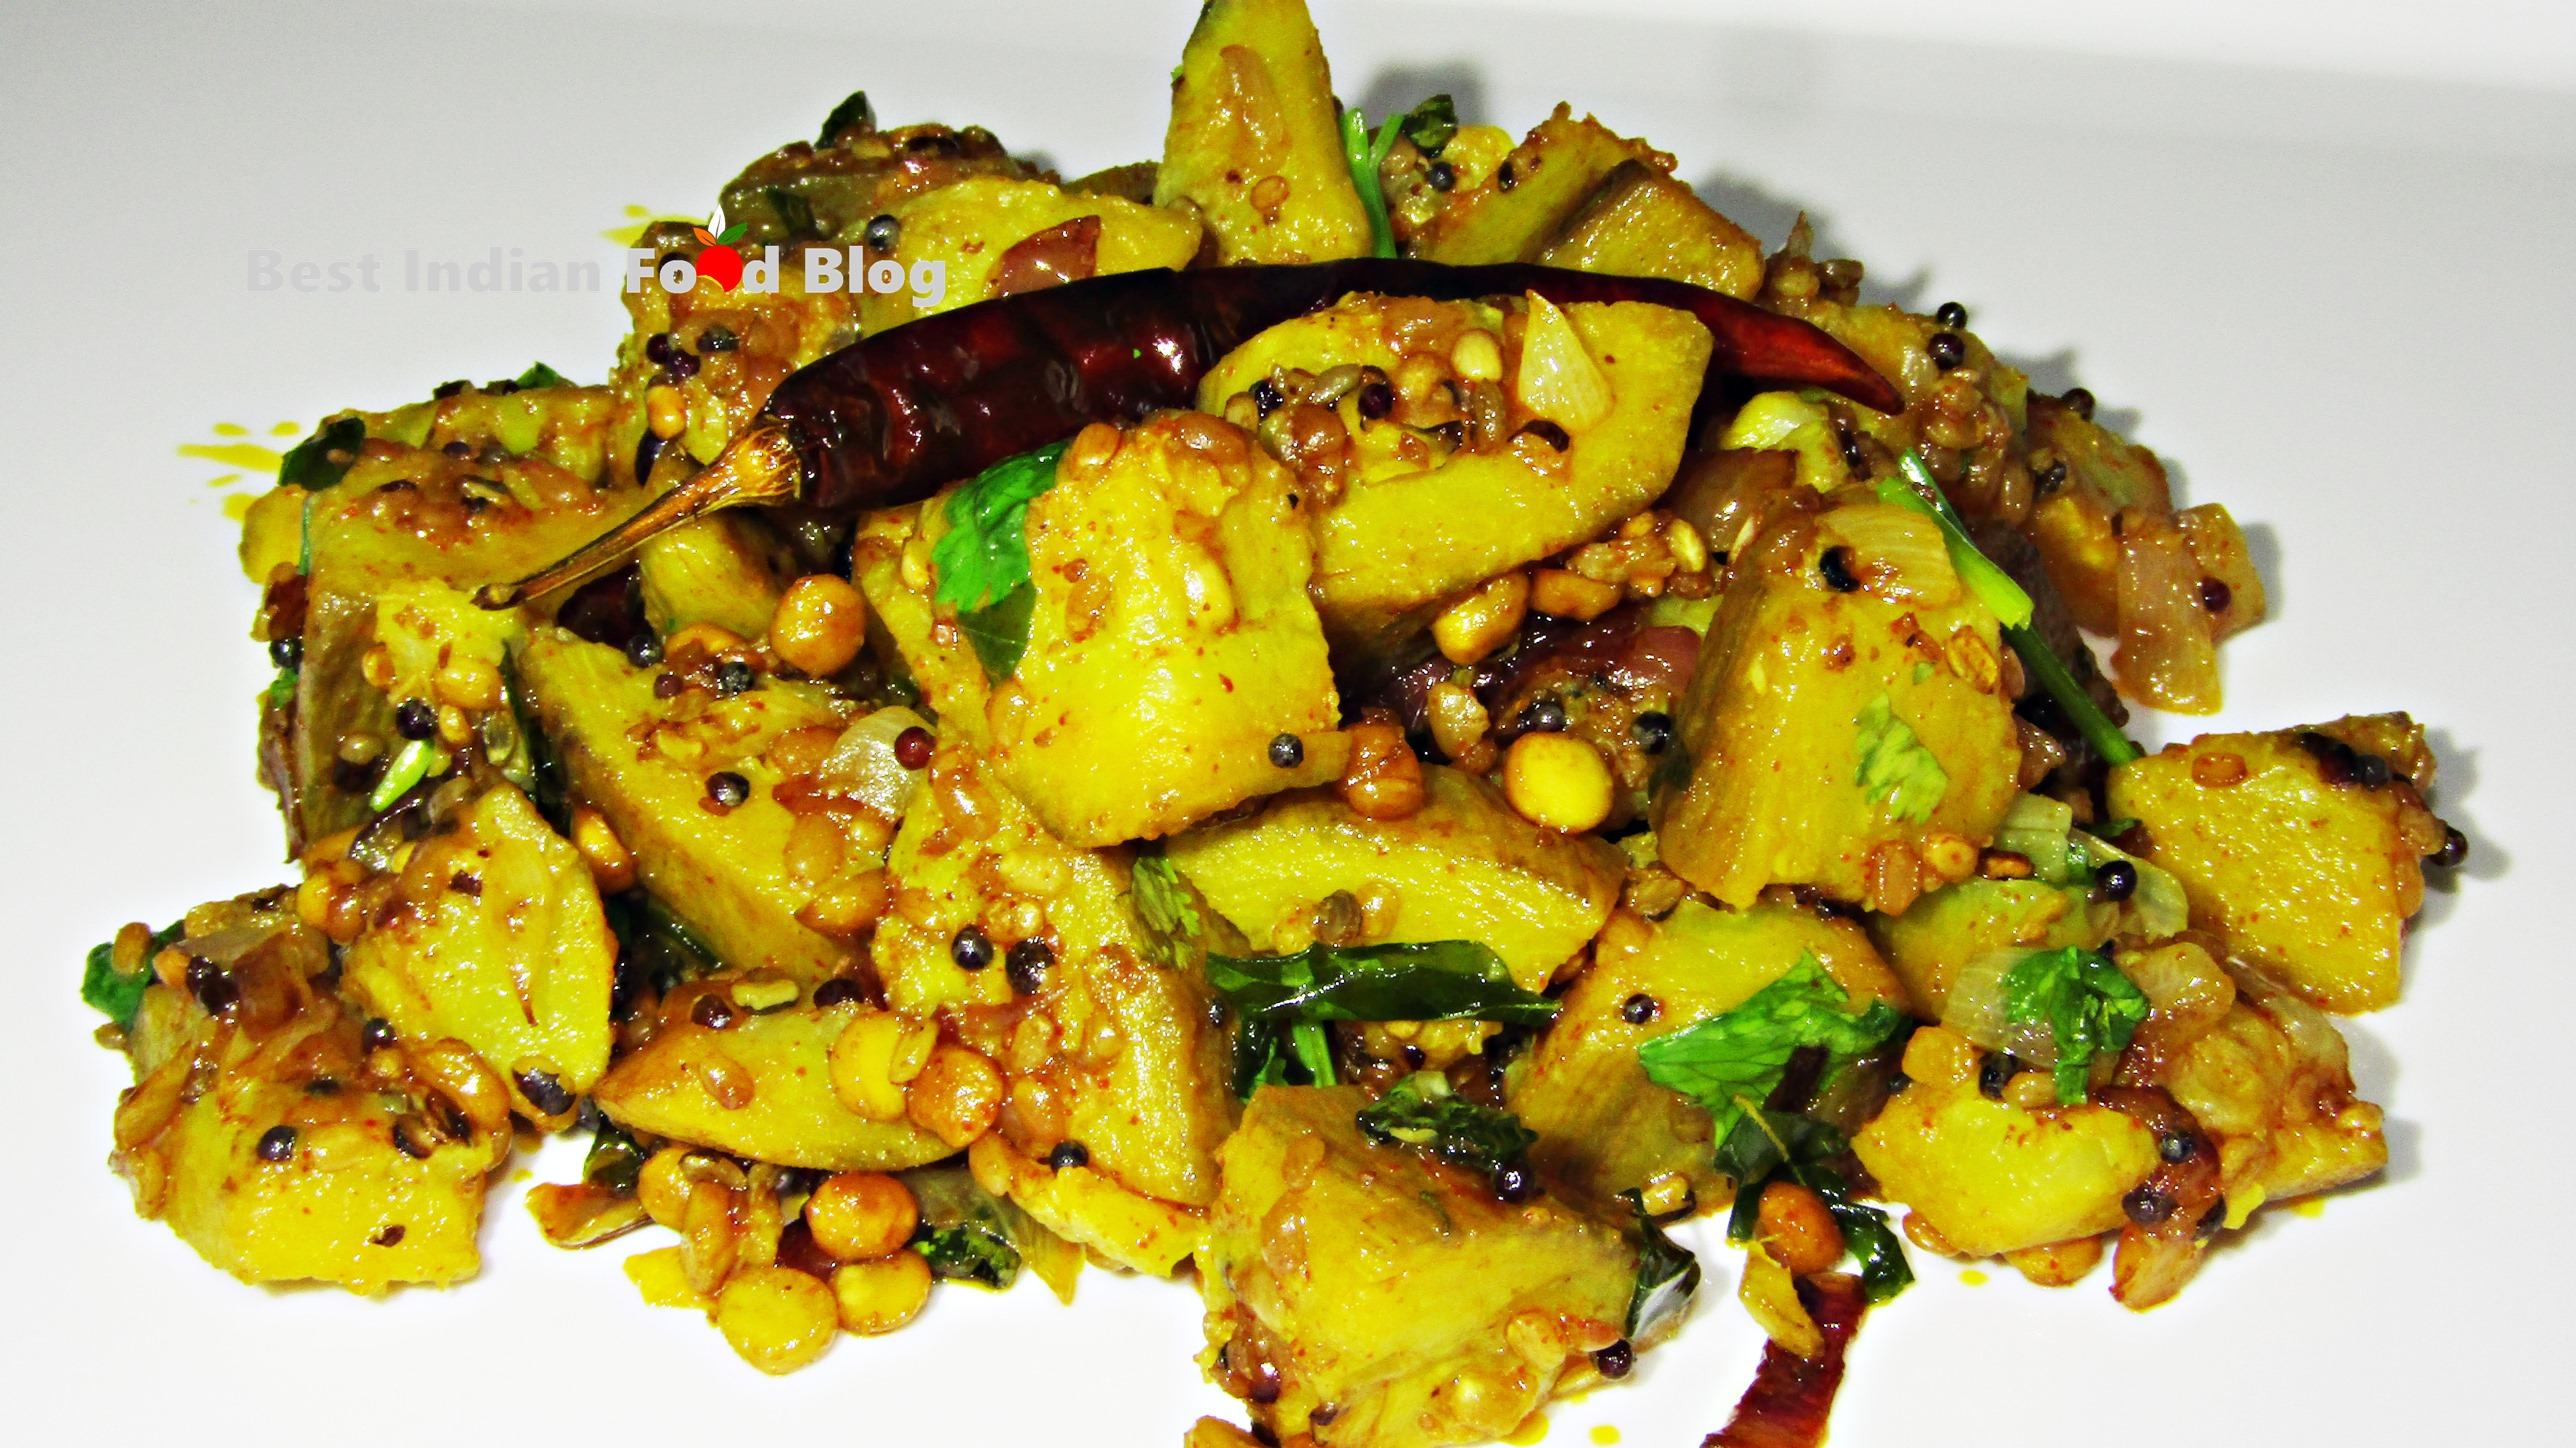 Vazhakkai Poriyal from Karnataka, India | Best Indian Food Blog